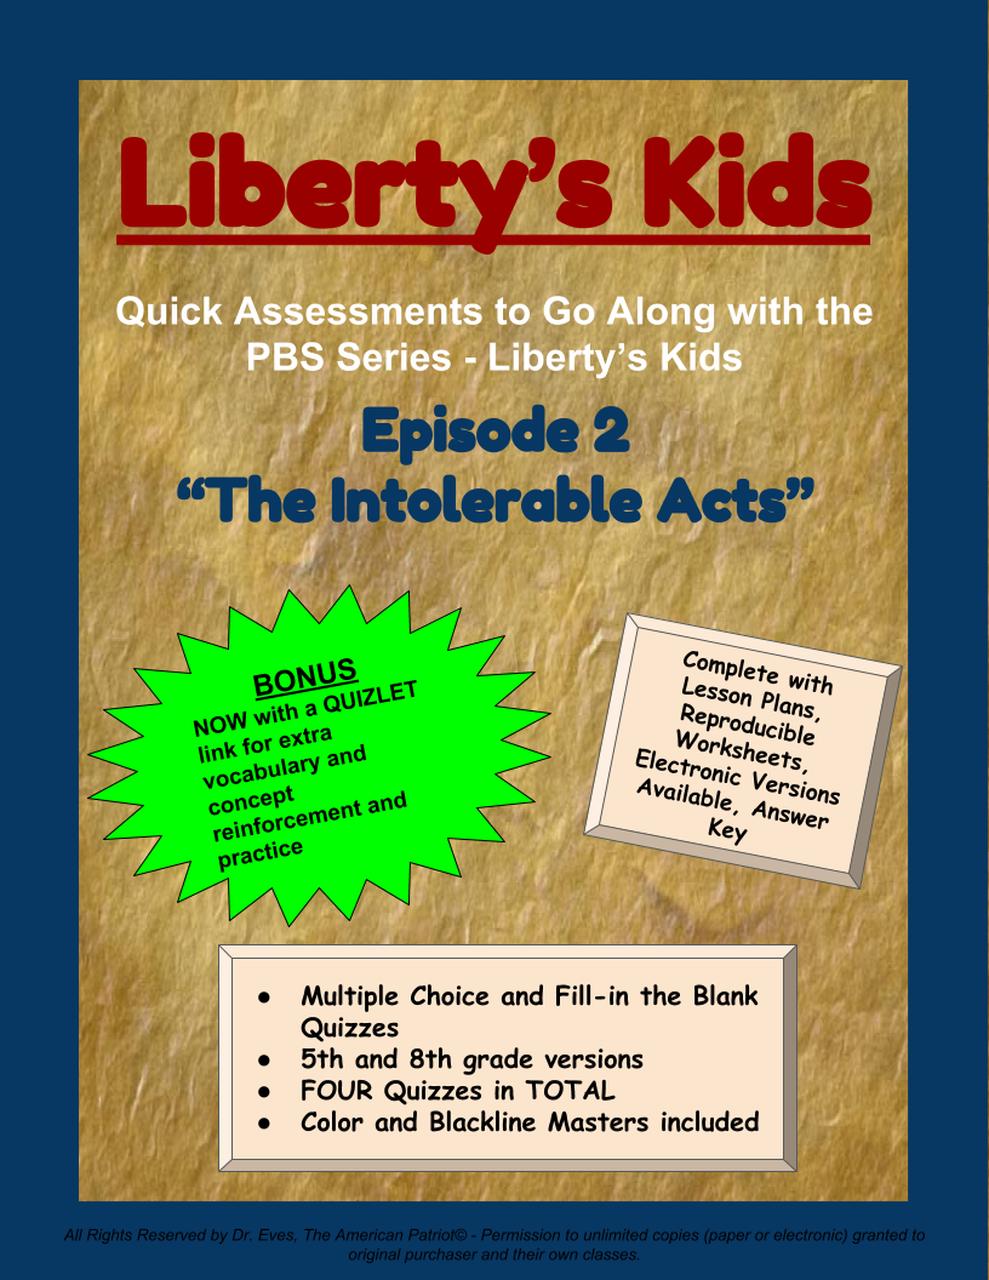 Liberty s kids episode. Intolerable acts clipart colonization